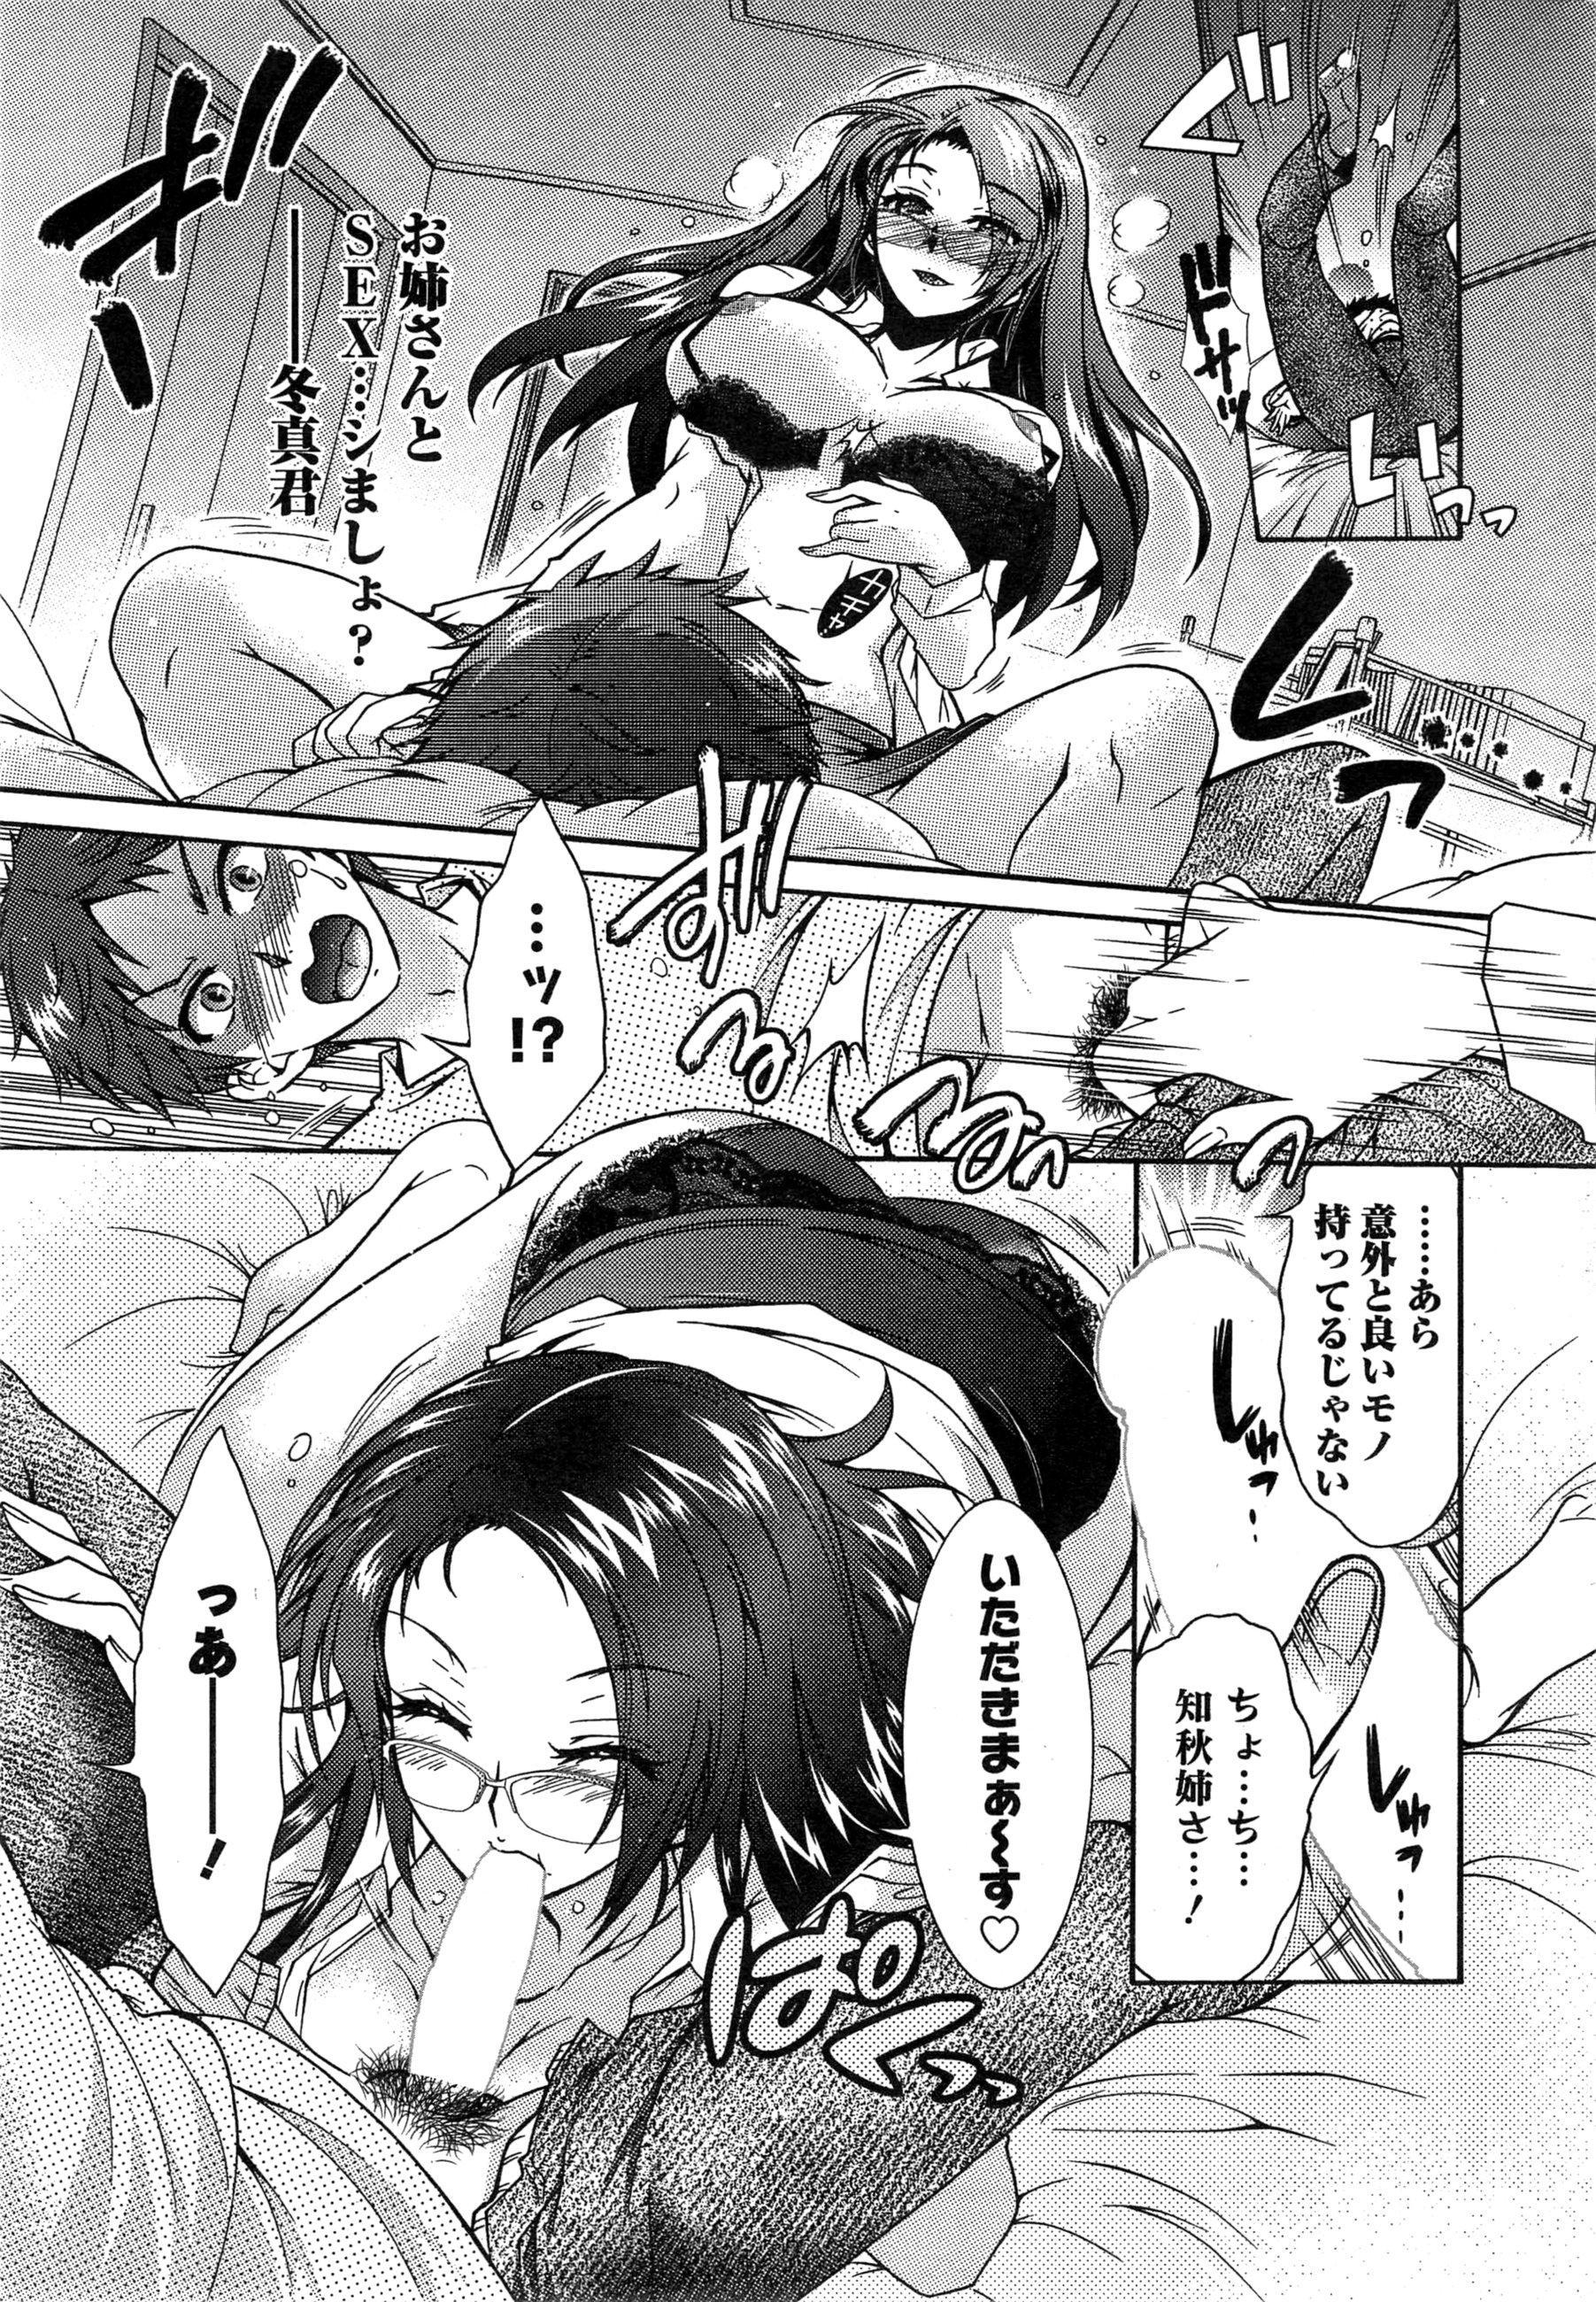 [Honda Arima] Sanshimai no Omocha - The Slave of Three Sisters Ch. 1-6 11